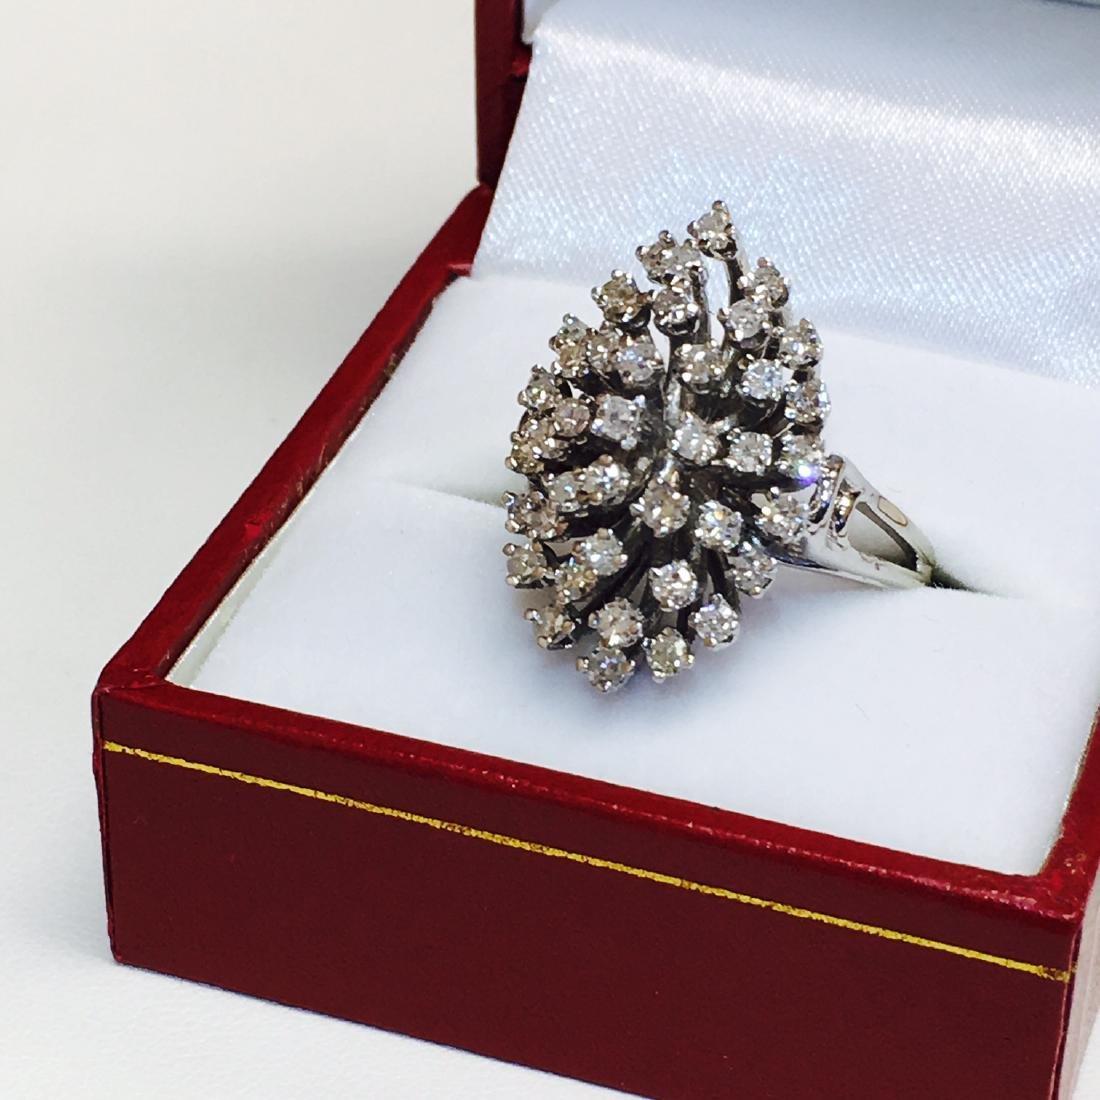 14k Gold & White Diamond Cocktail Ring - 4